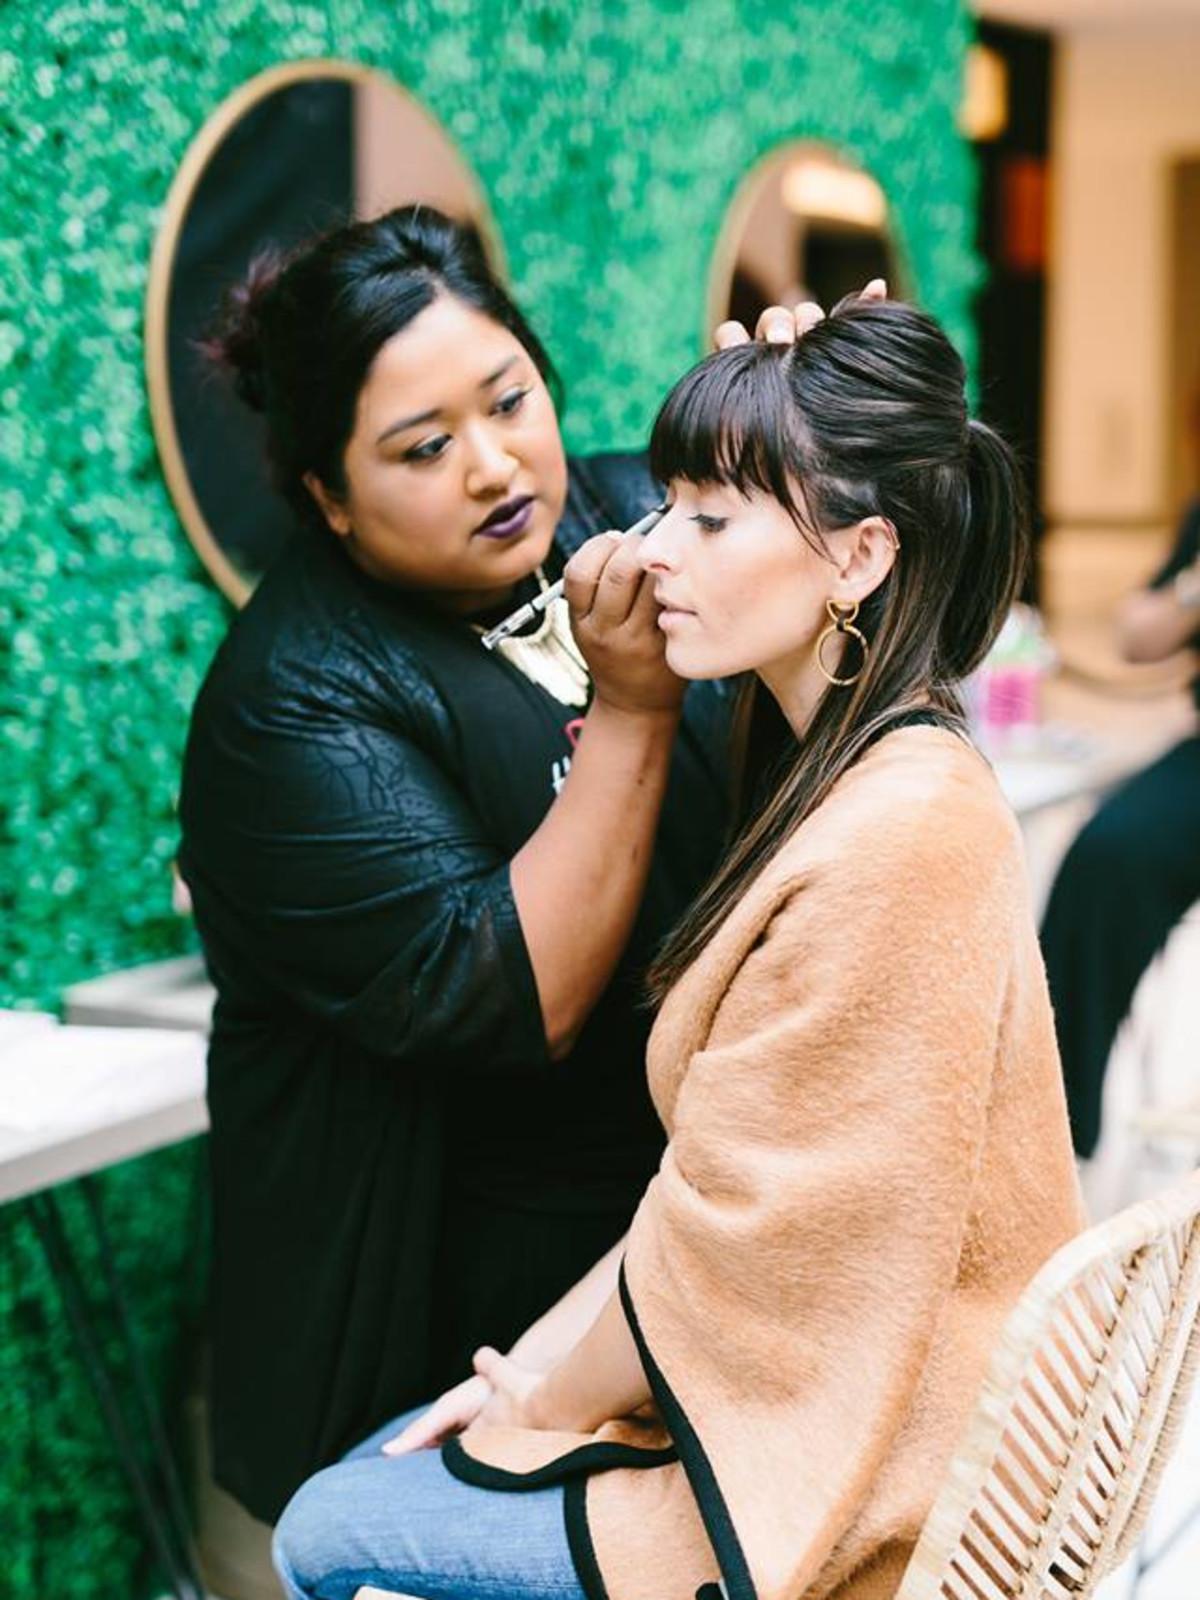 Woman makeup summit style